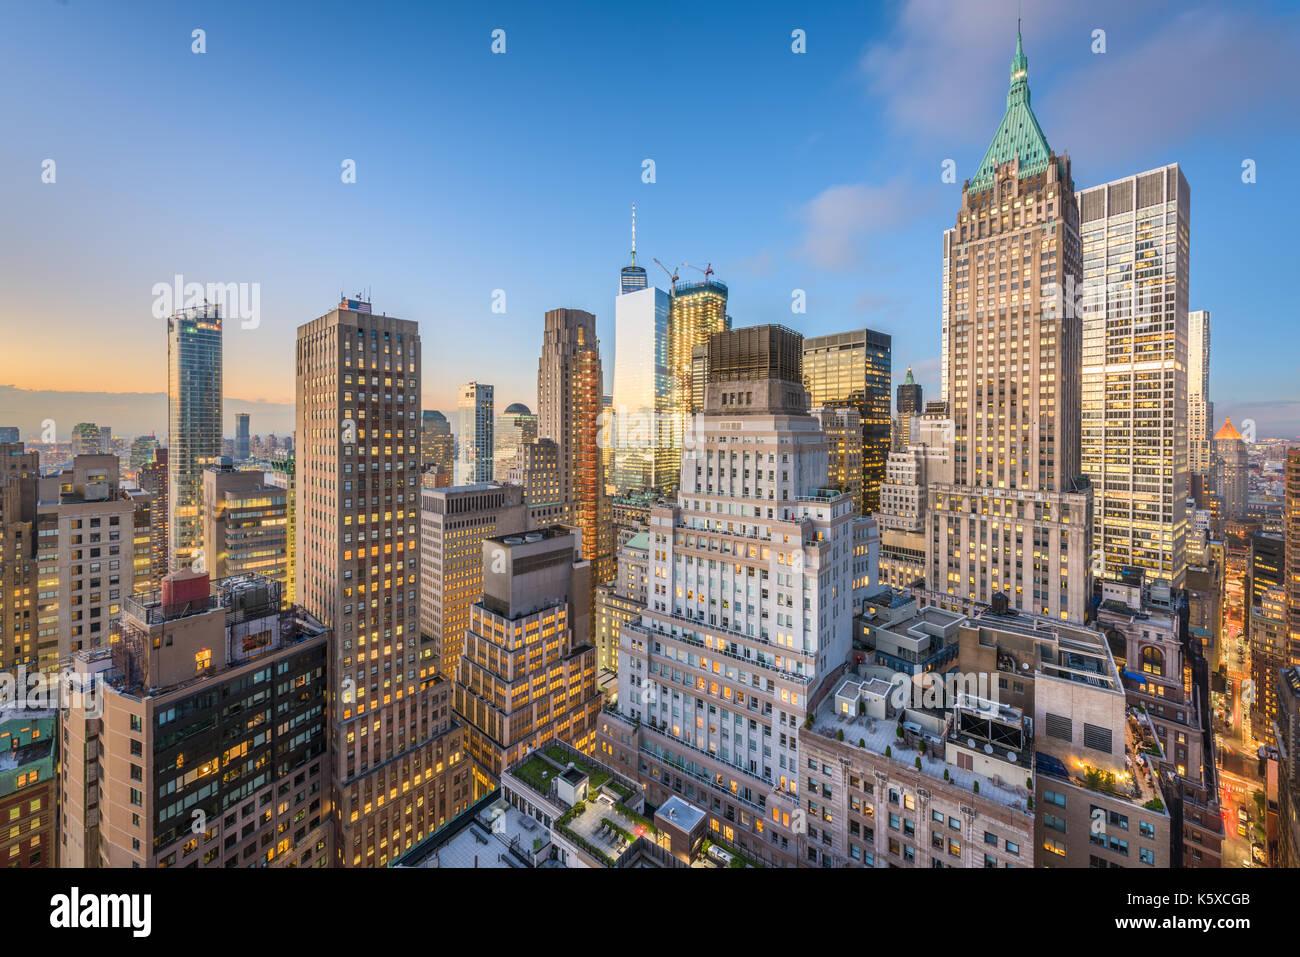 New York City Financial District Stadtbild in der Dämmerung. Stockbild